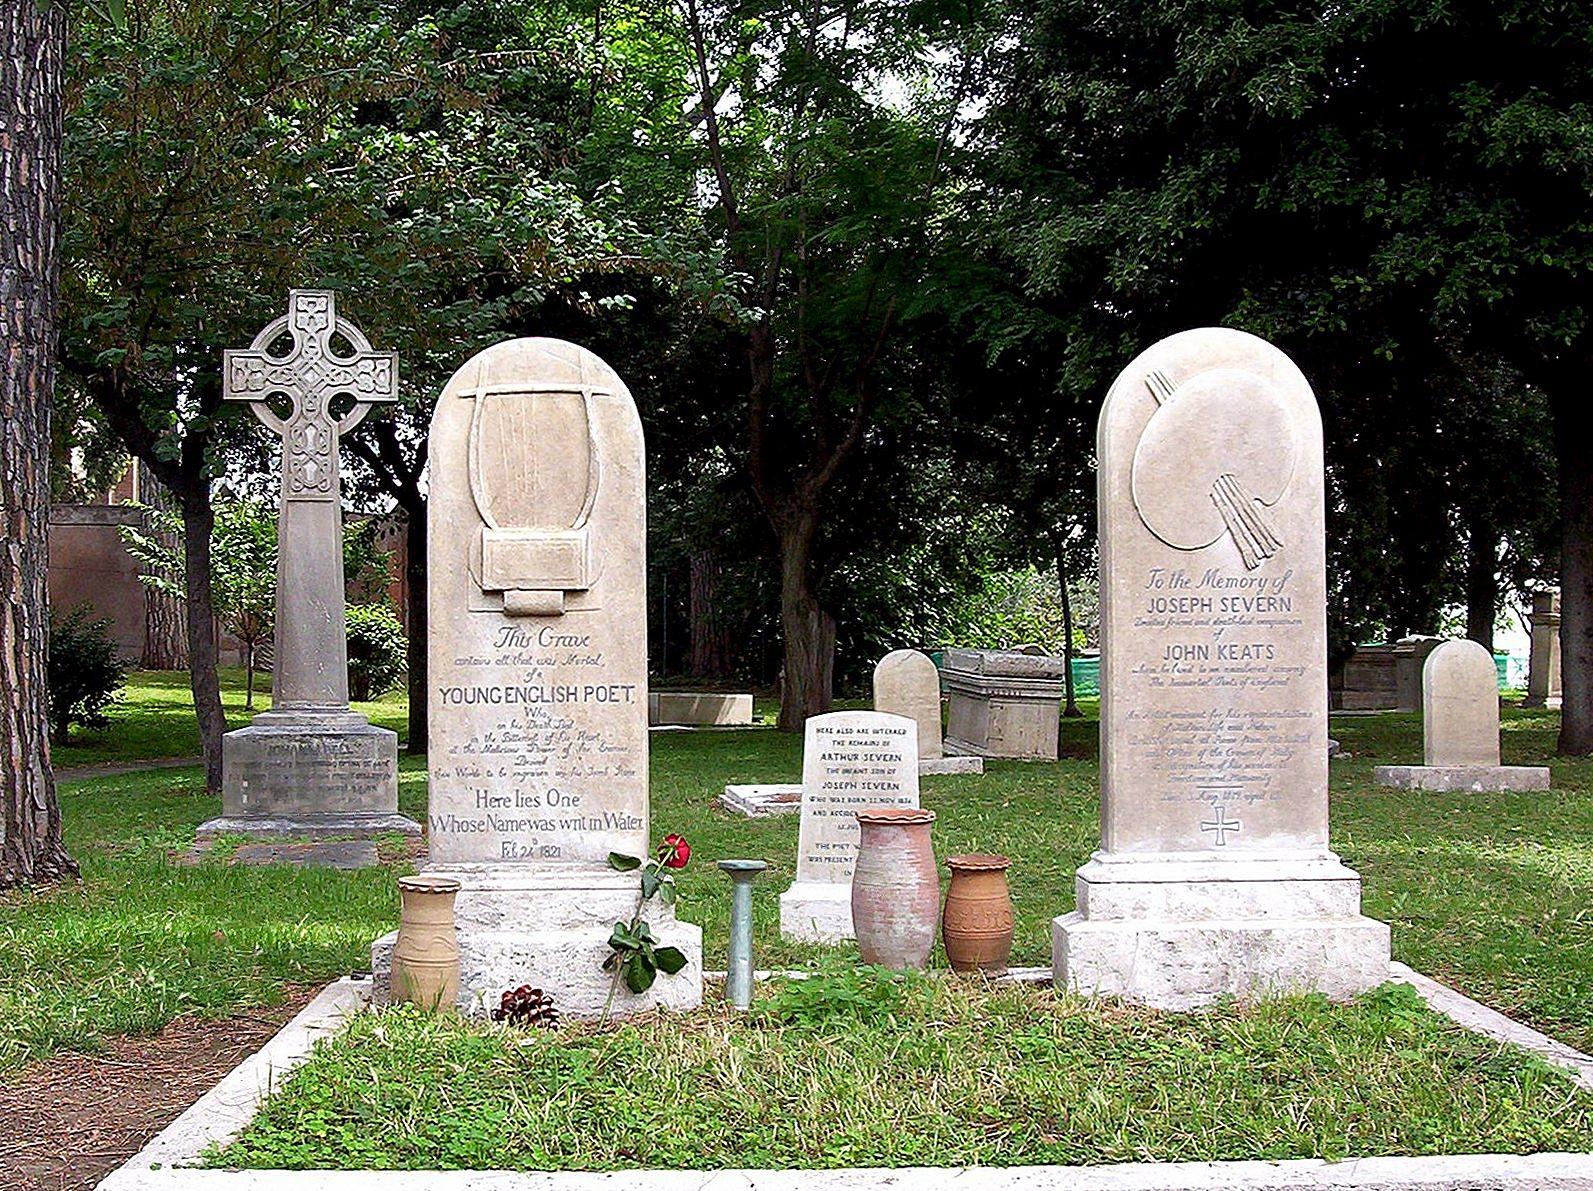 https://upload.wikimedia.org/wikipedia/commons/8/8c/Keats_grave.jpg